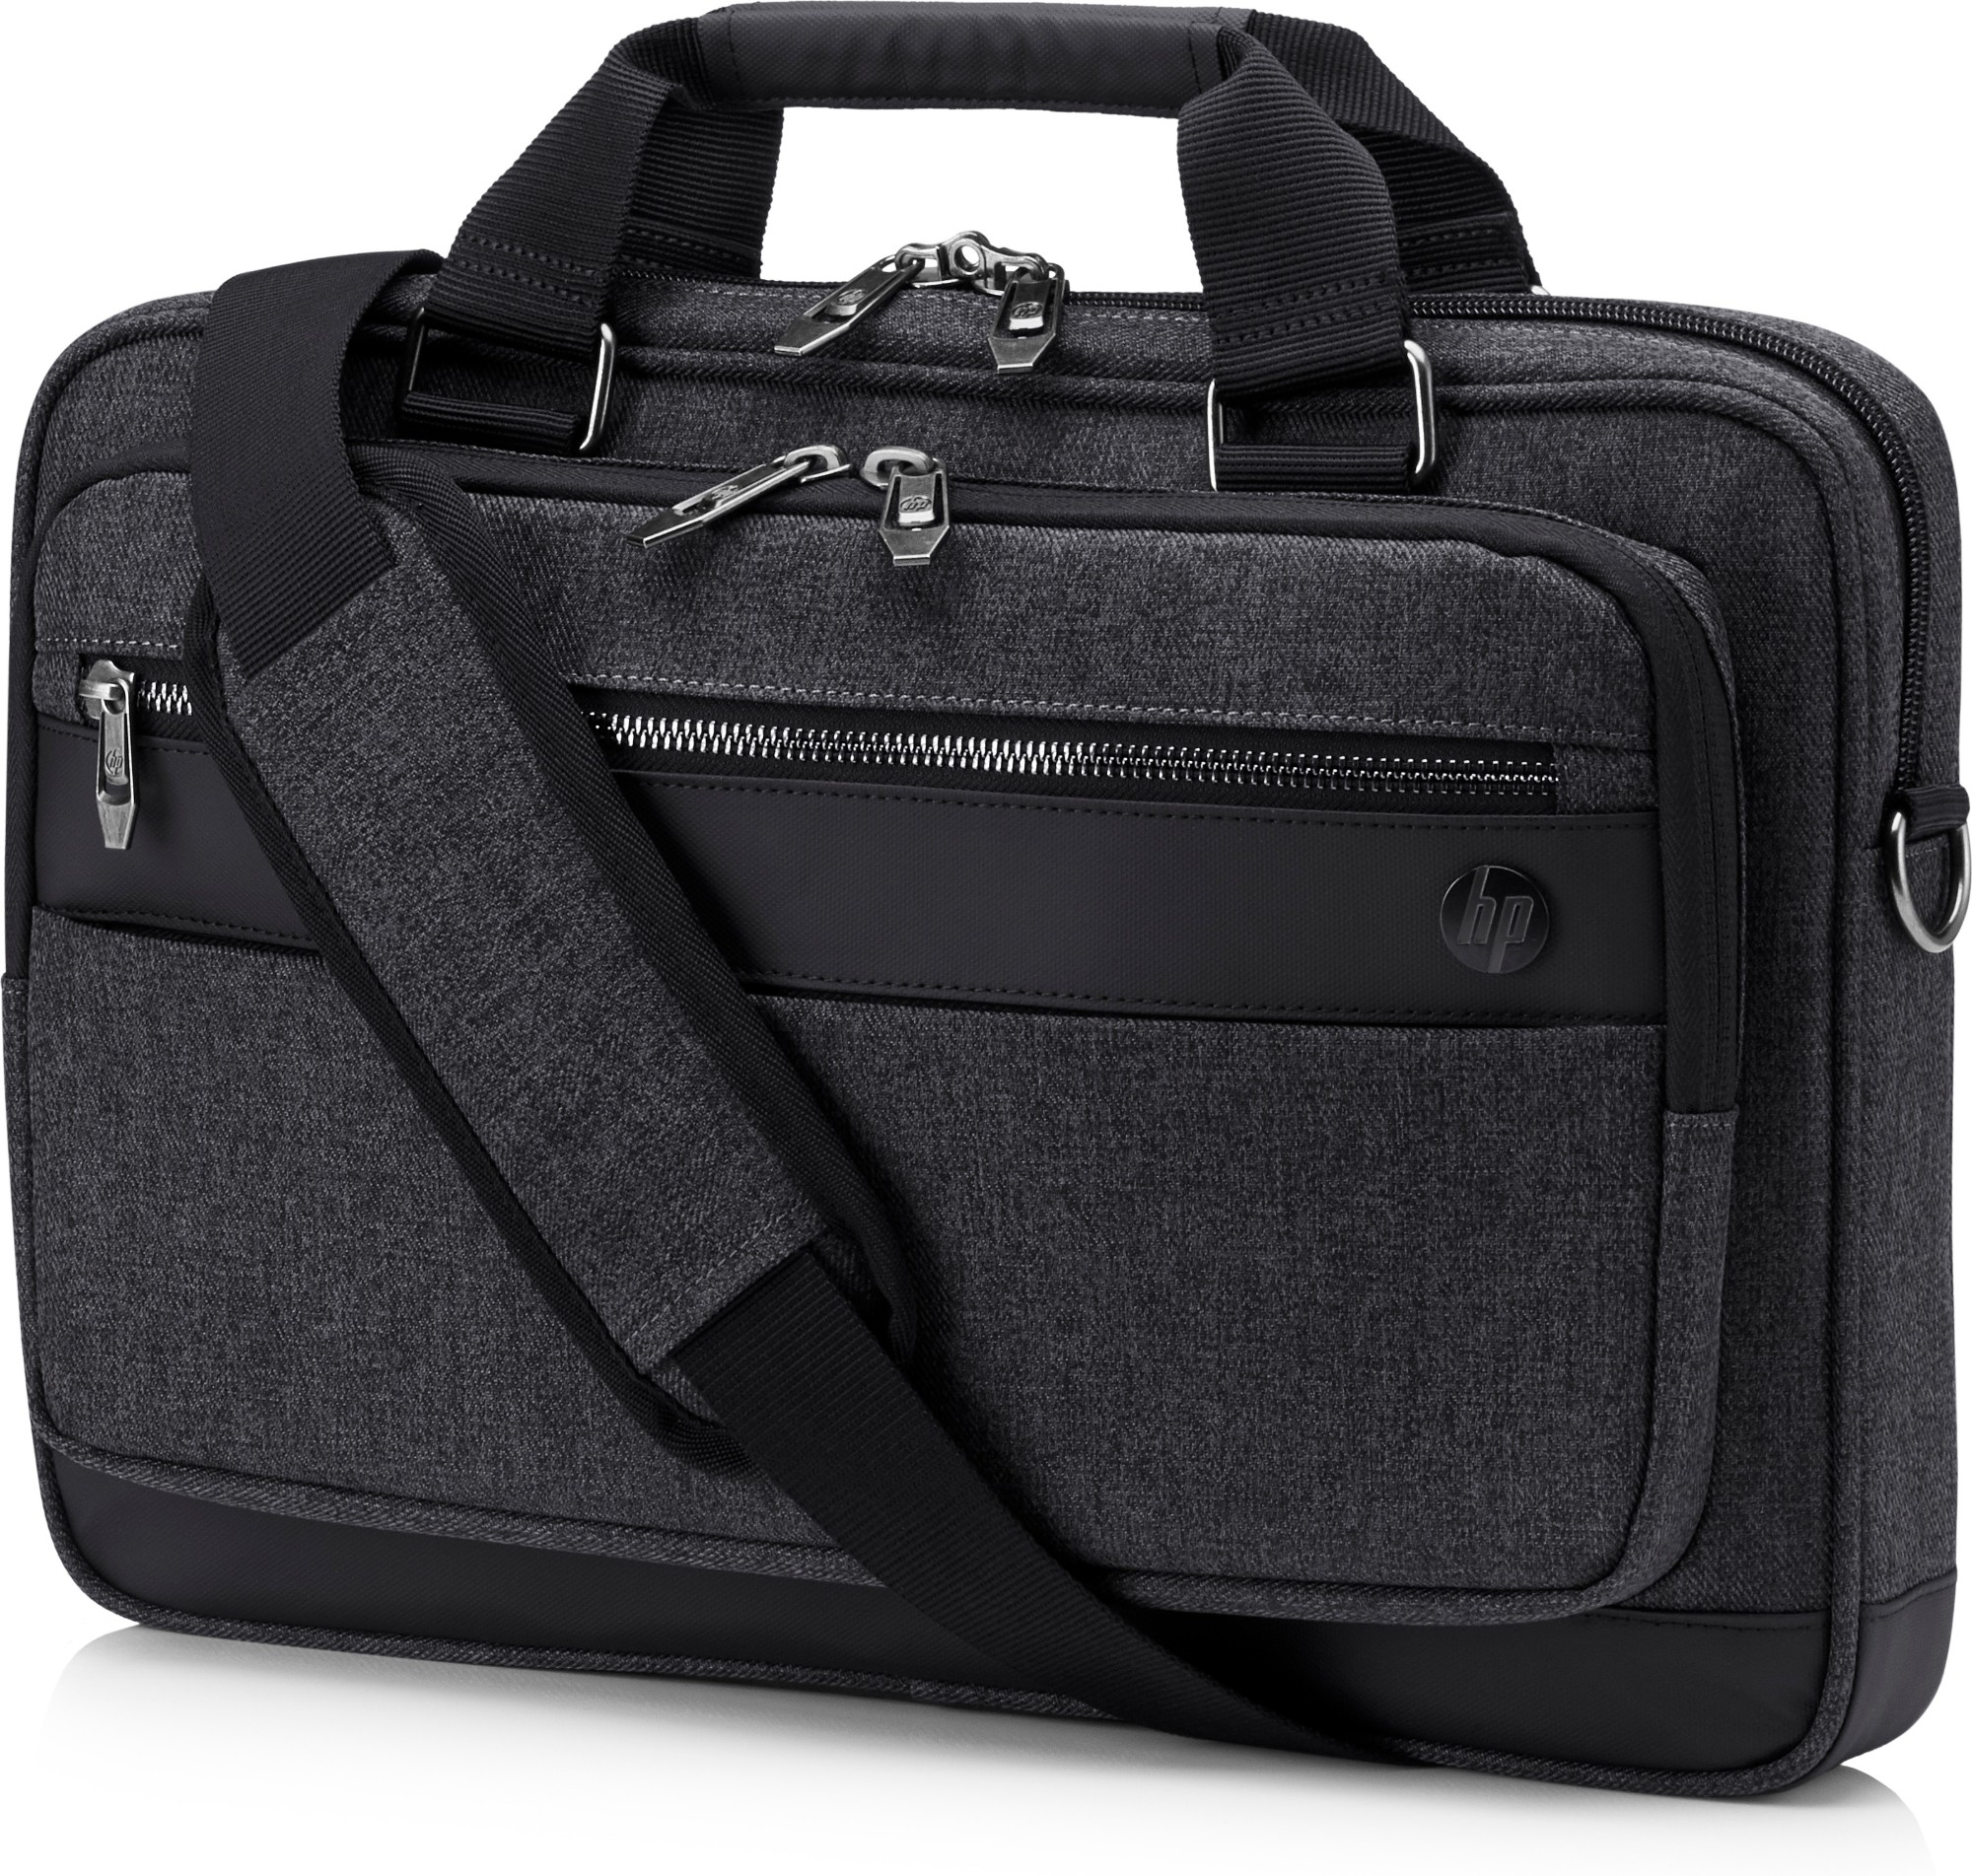 "HP Executive 14.1 Slim Top Load maletines para portátil 35,8 cm (14.1"") Maletín Gris"